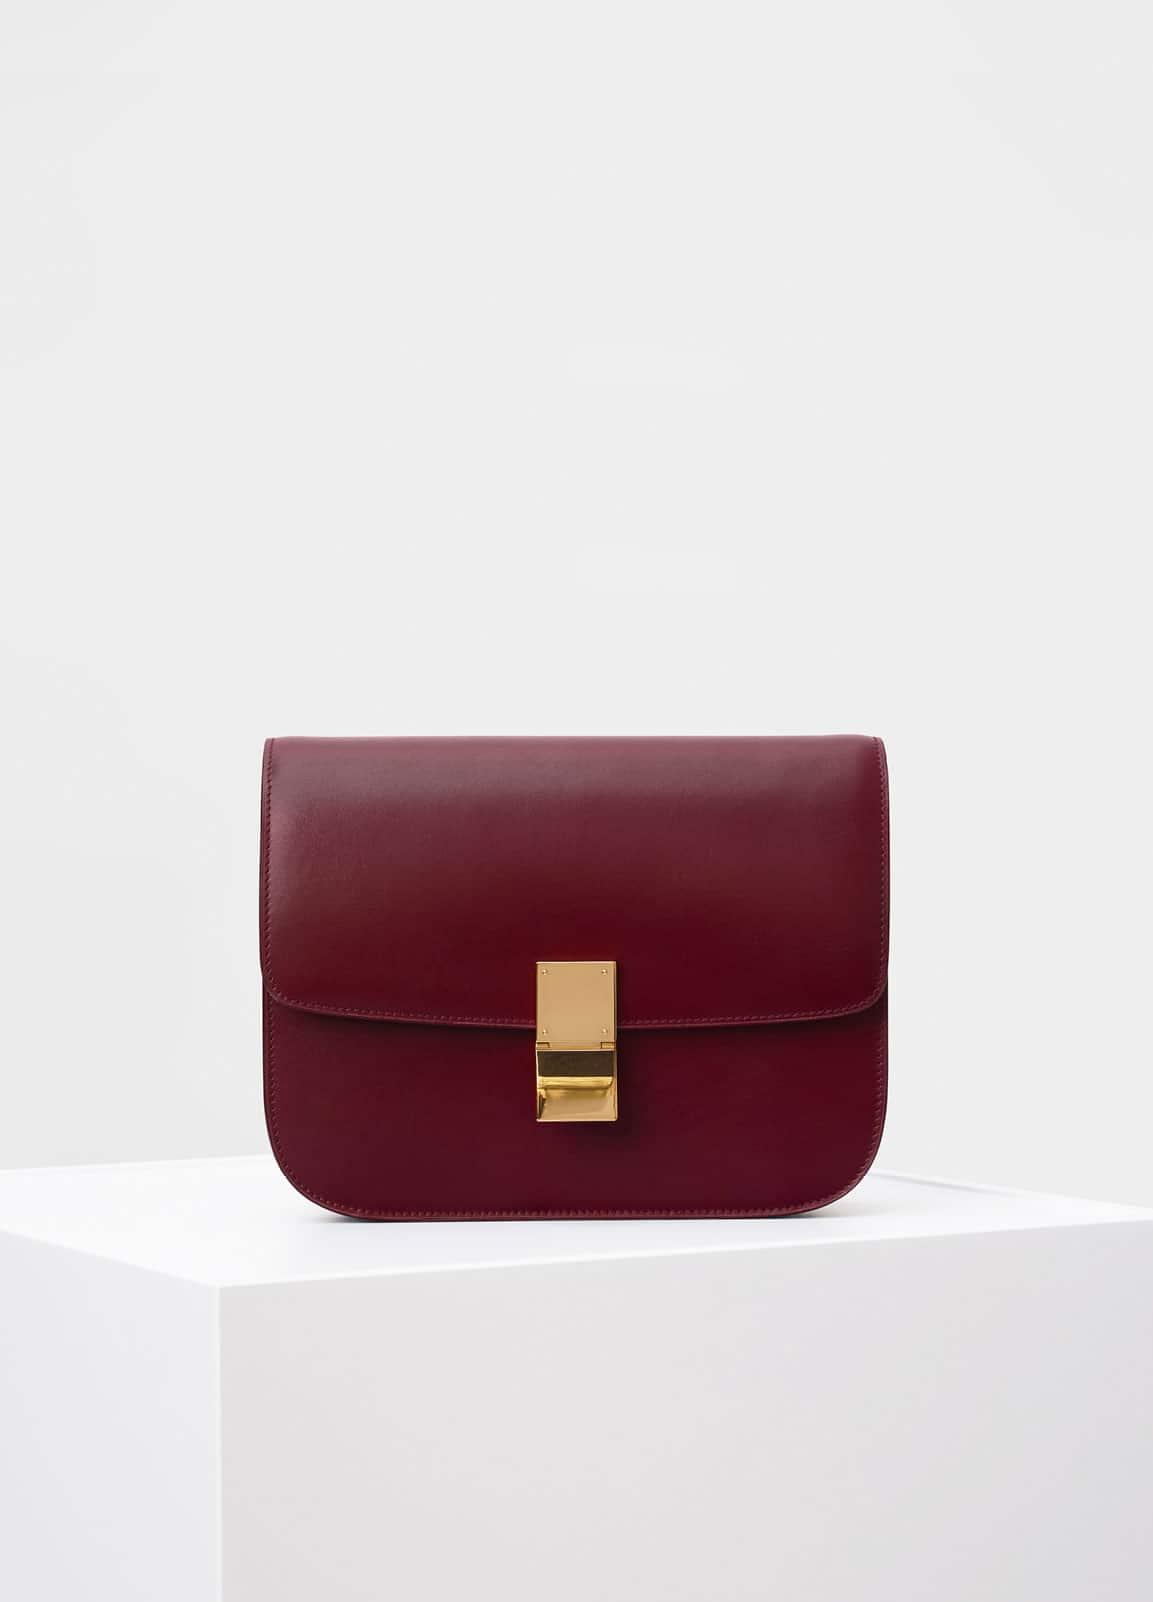 eb66466cc46c3 Celine Winter 2016 Bag Collection featuring Pastels